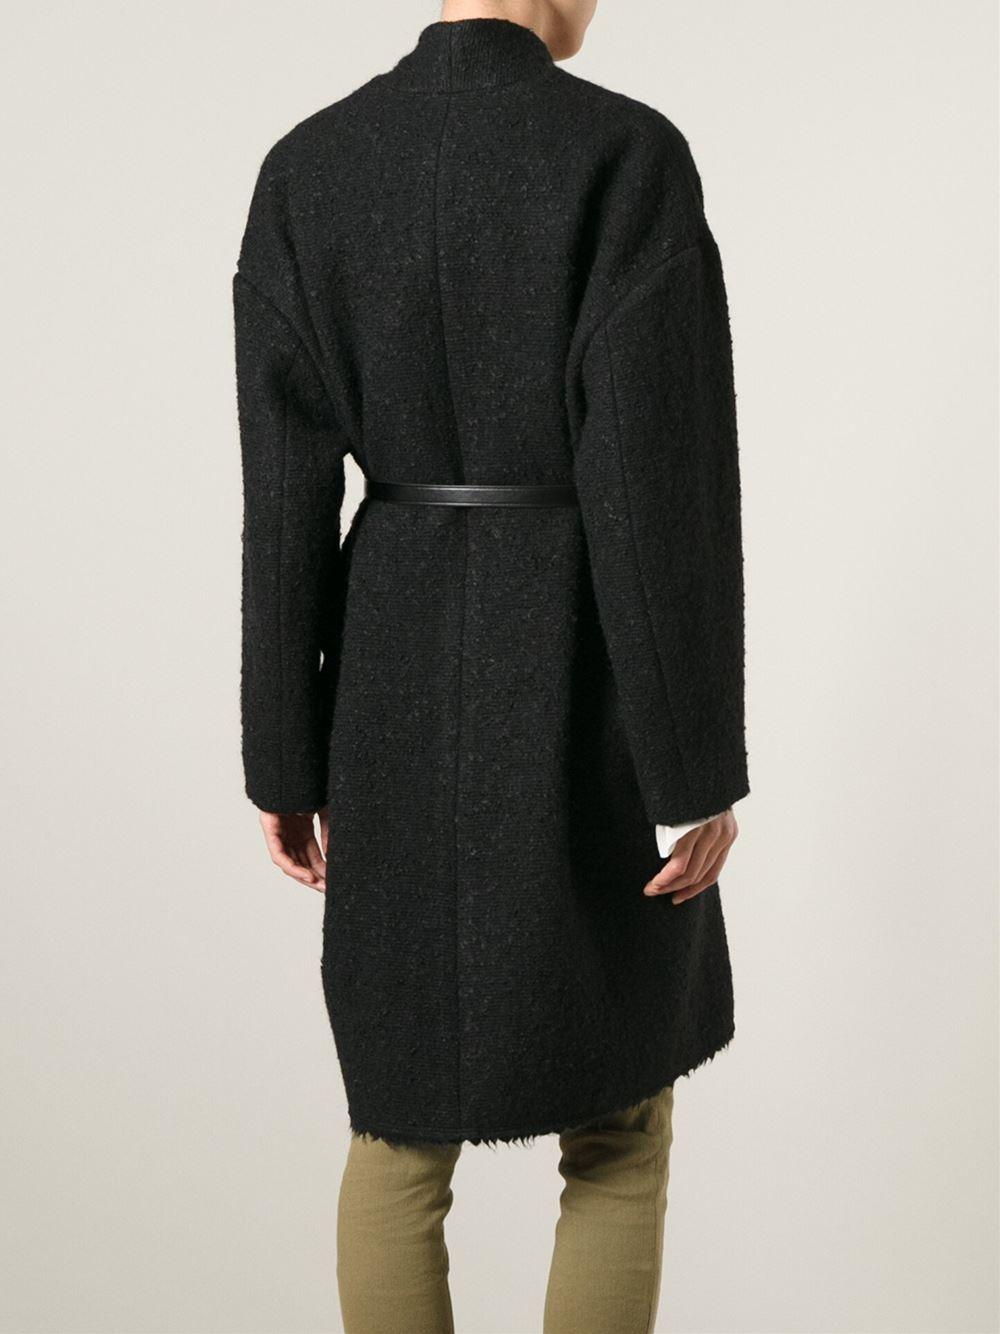 Lyst Isabel Marant Seal Coat In Black